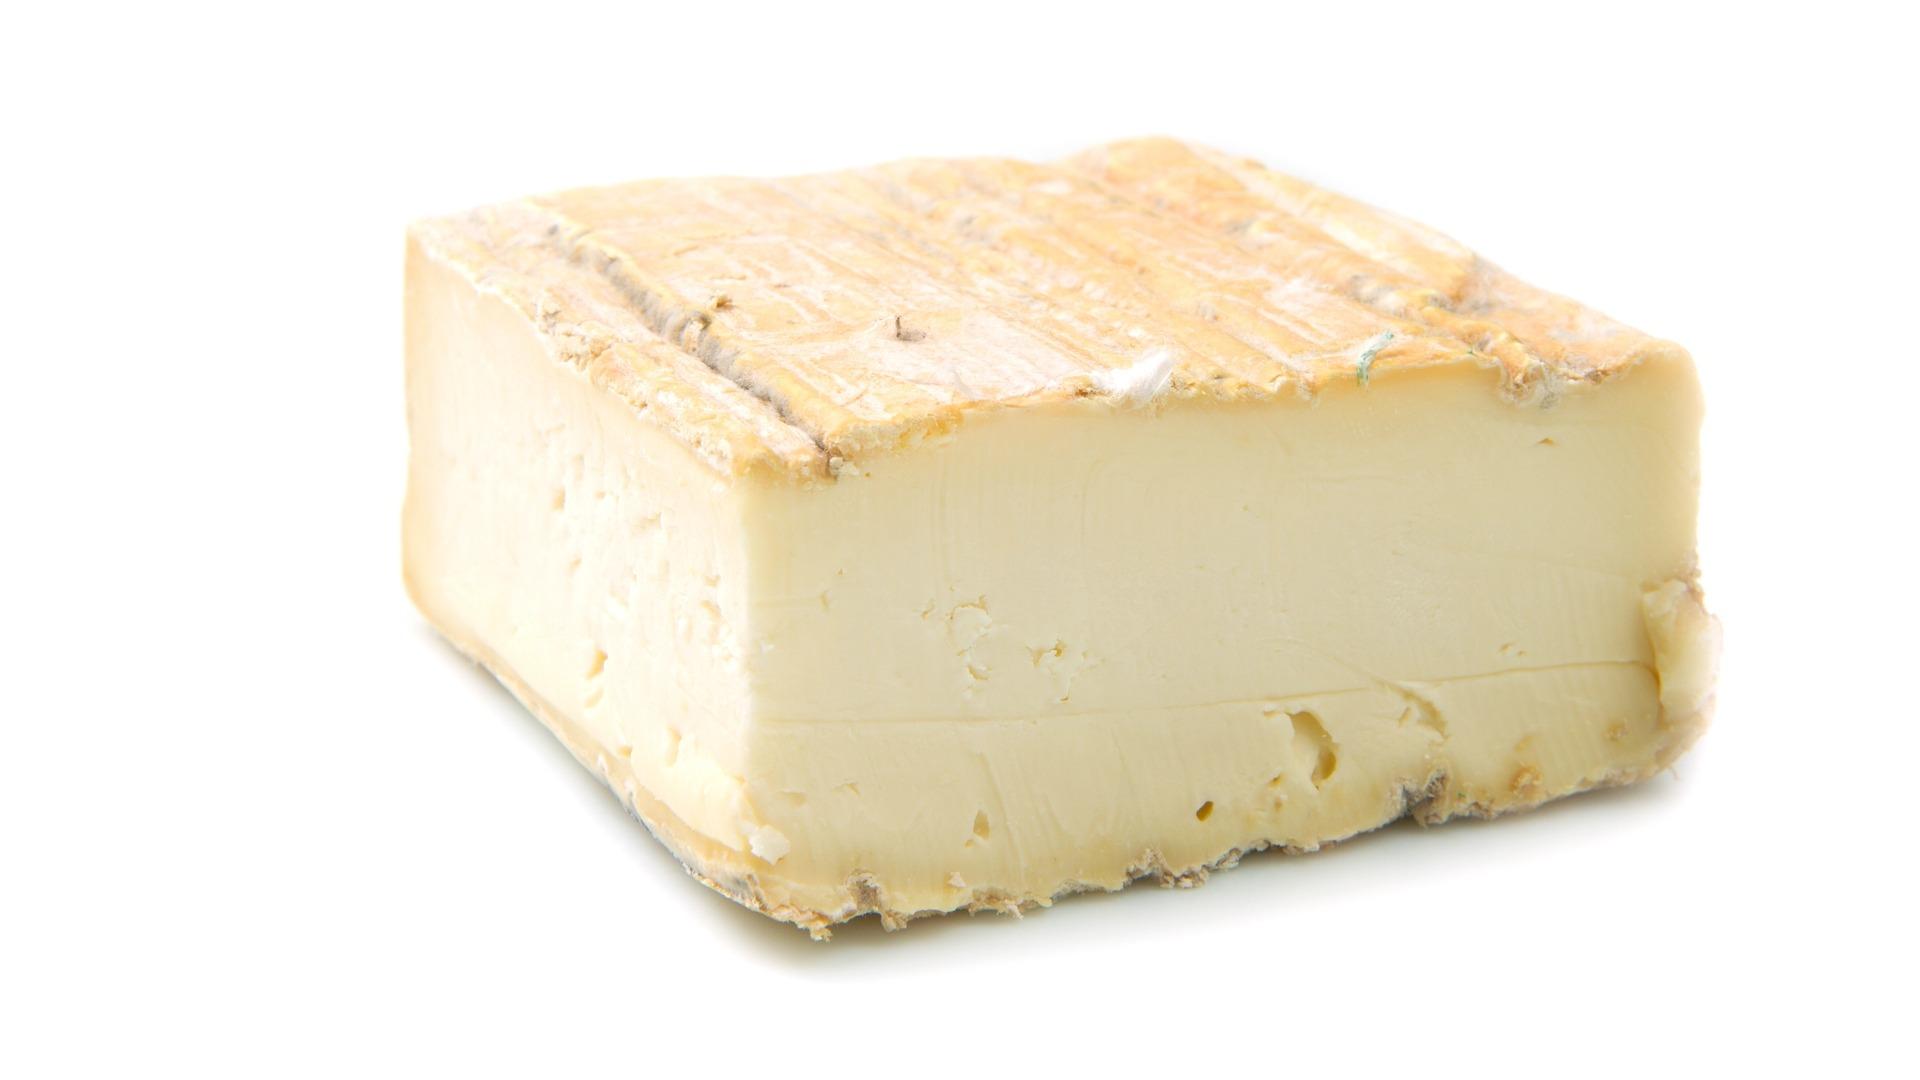 taleggio, cheese, cow, washed rind, italian